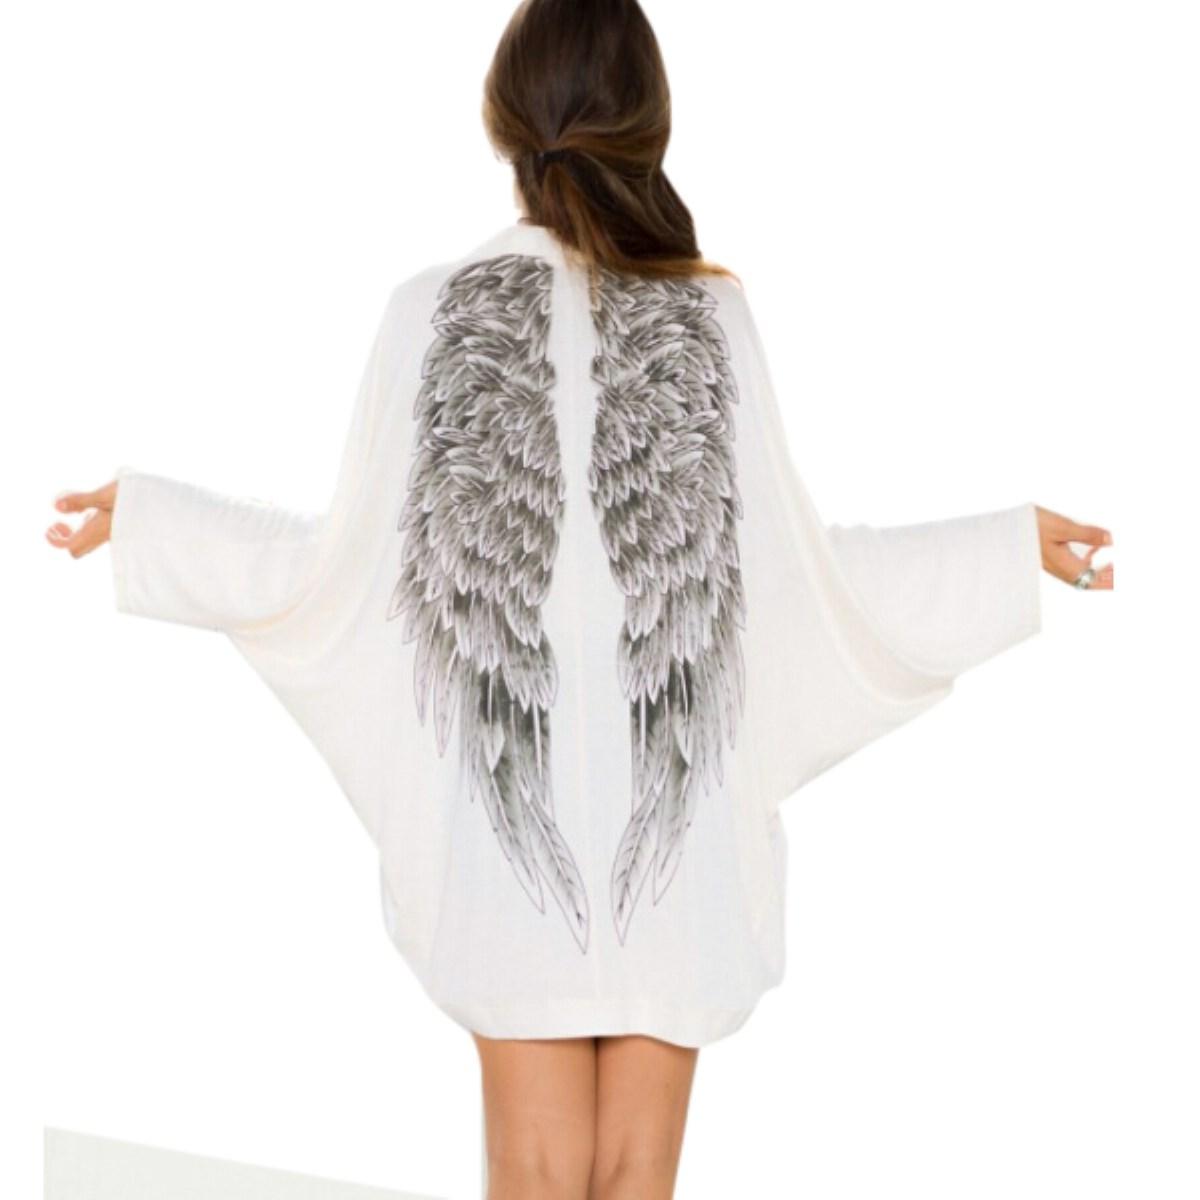 2015 Autumn Back Angel Wings Print Womens Cardigan European Fashion Loose Jacket Female Brand Casual Coat Femininas Sweater(China (Mainland))